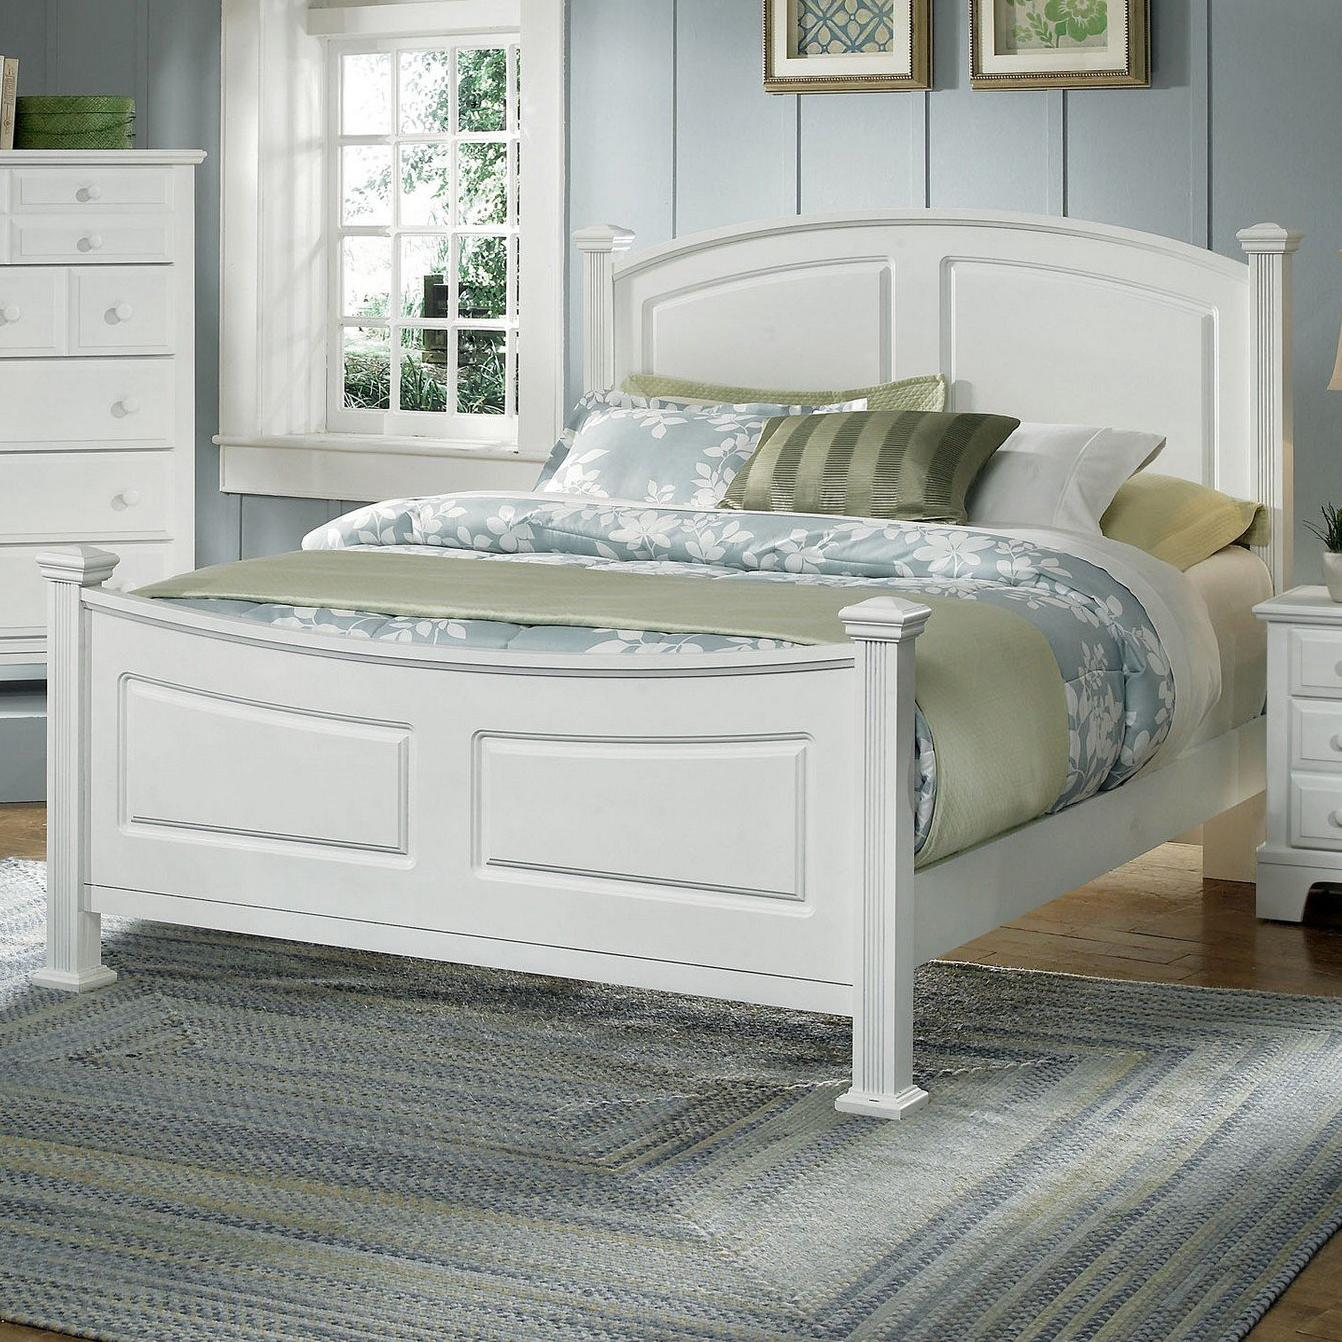 Hamilton/Franklin King Panel Bed by Vaughan Bassett at Steger's Furniture